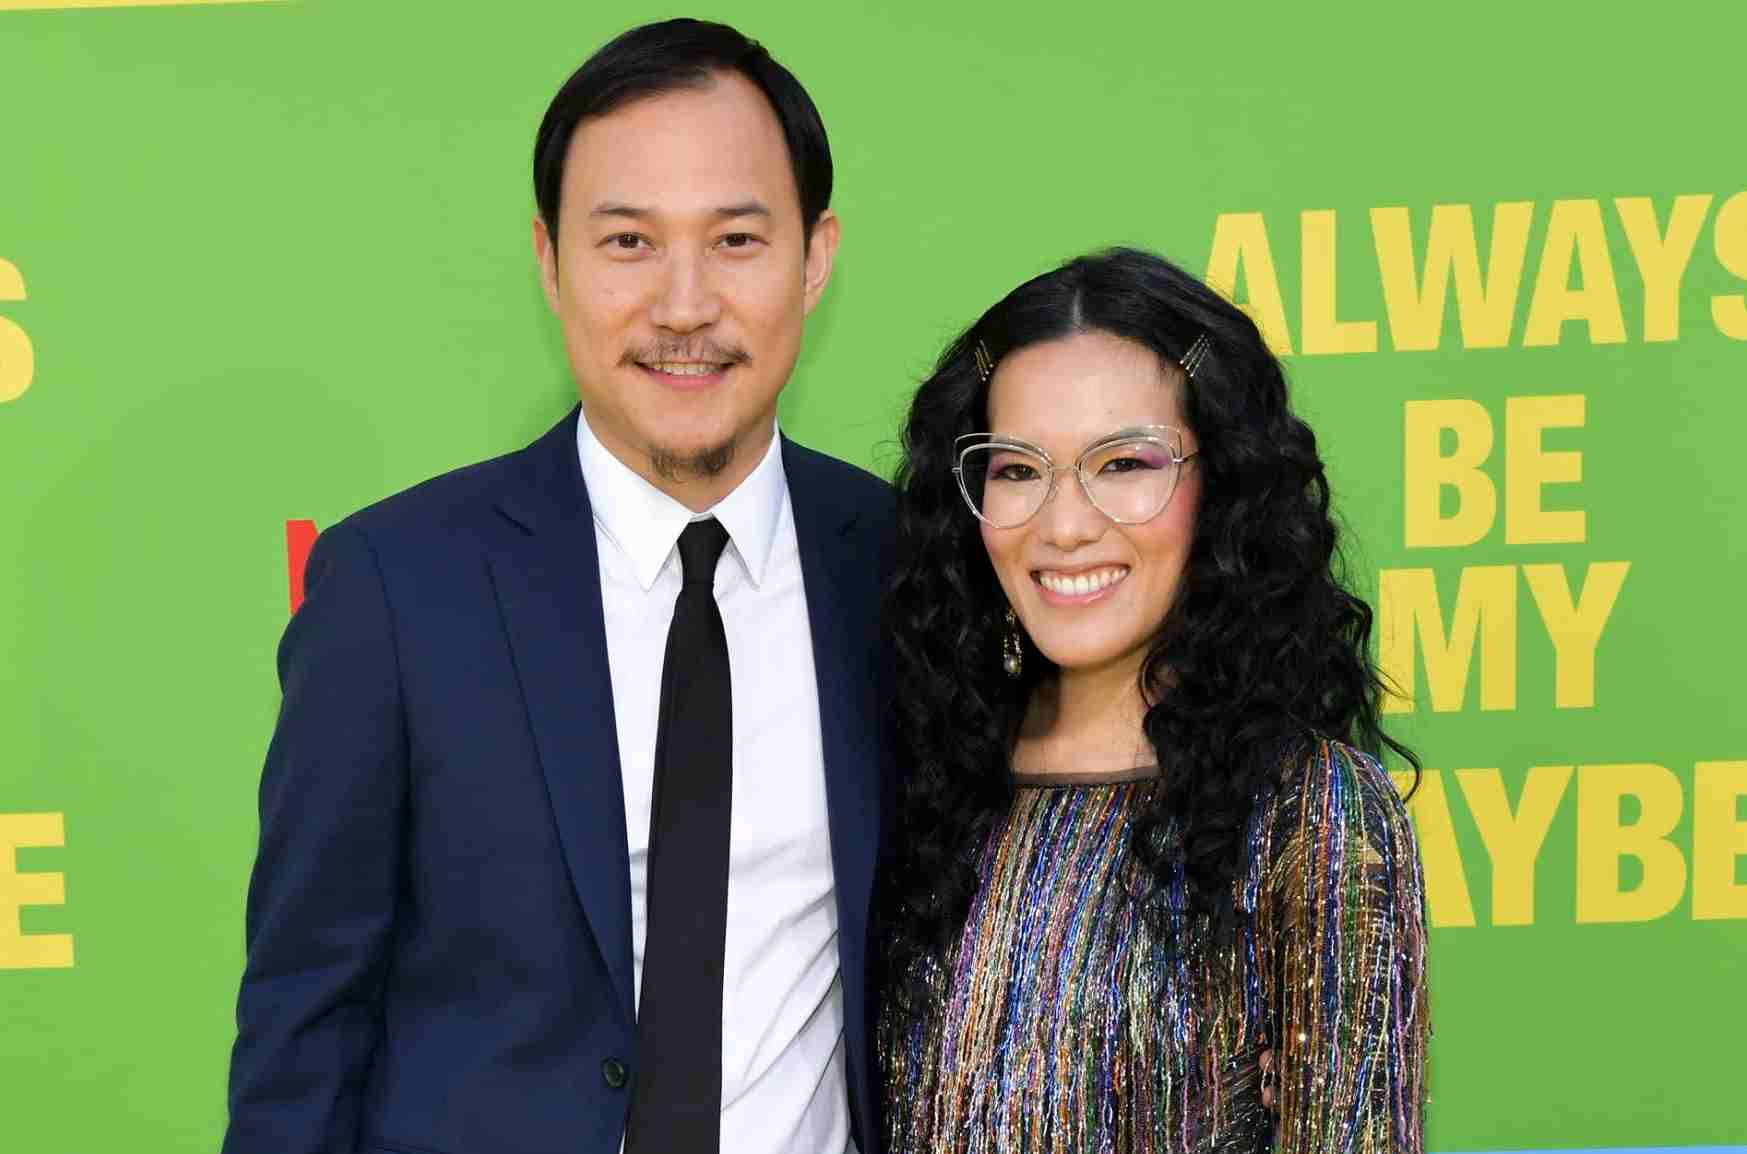 Image of successful couple, Ali Wong and Justin Hakuta